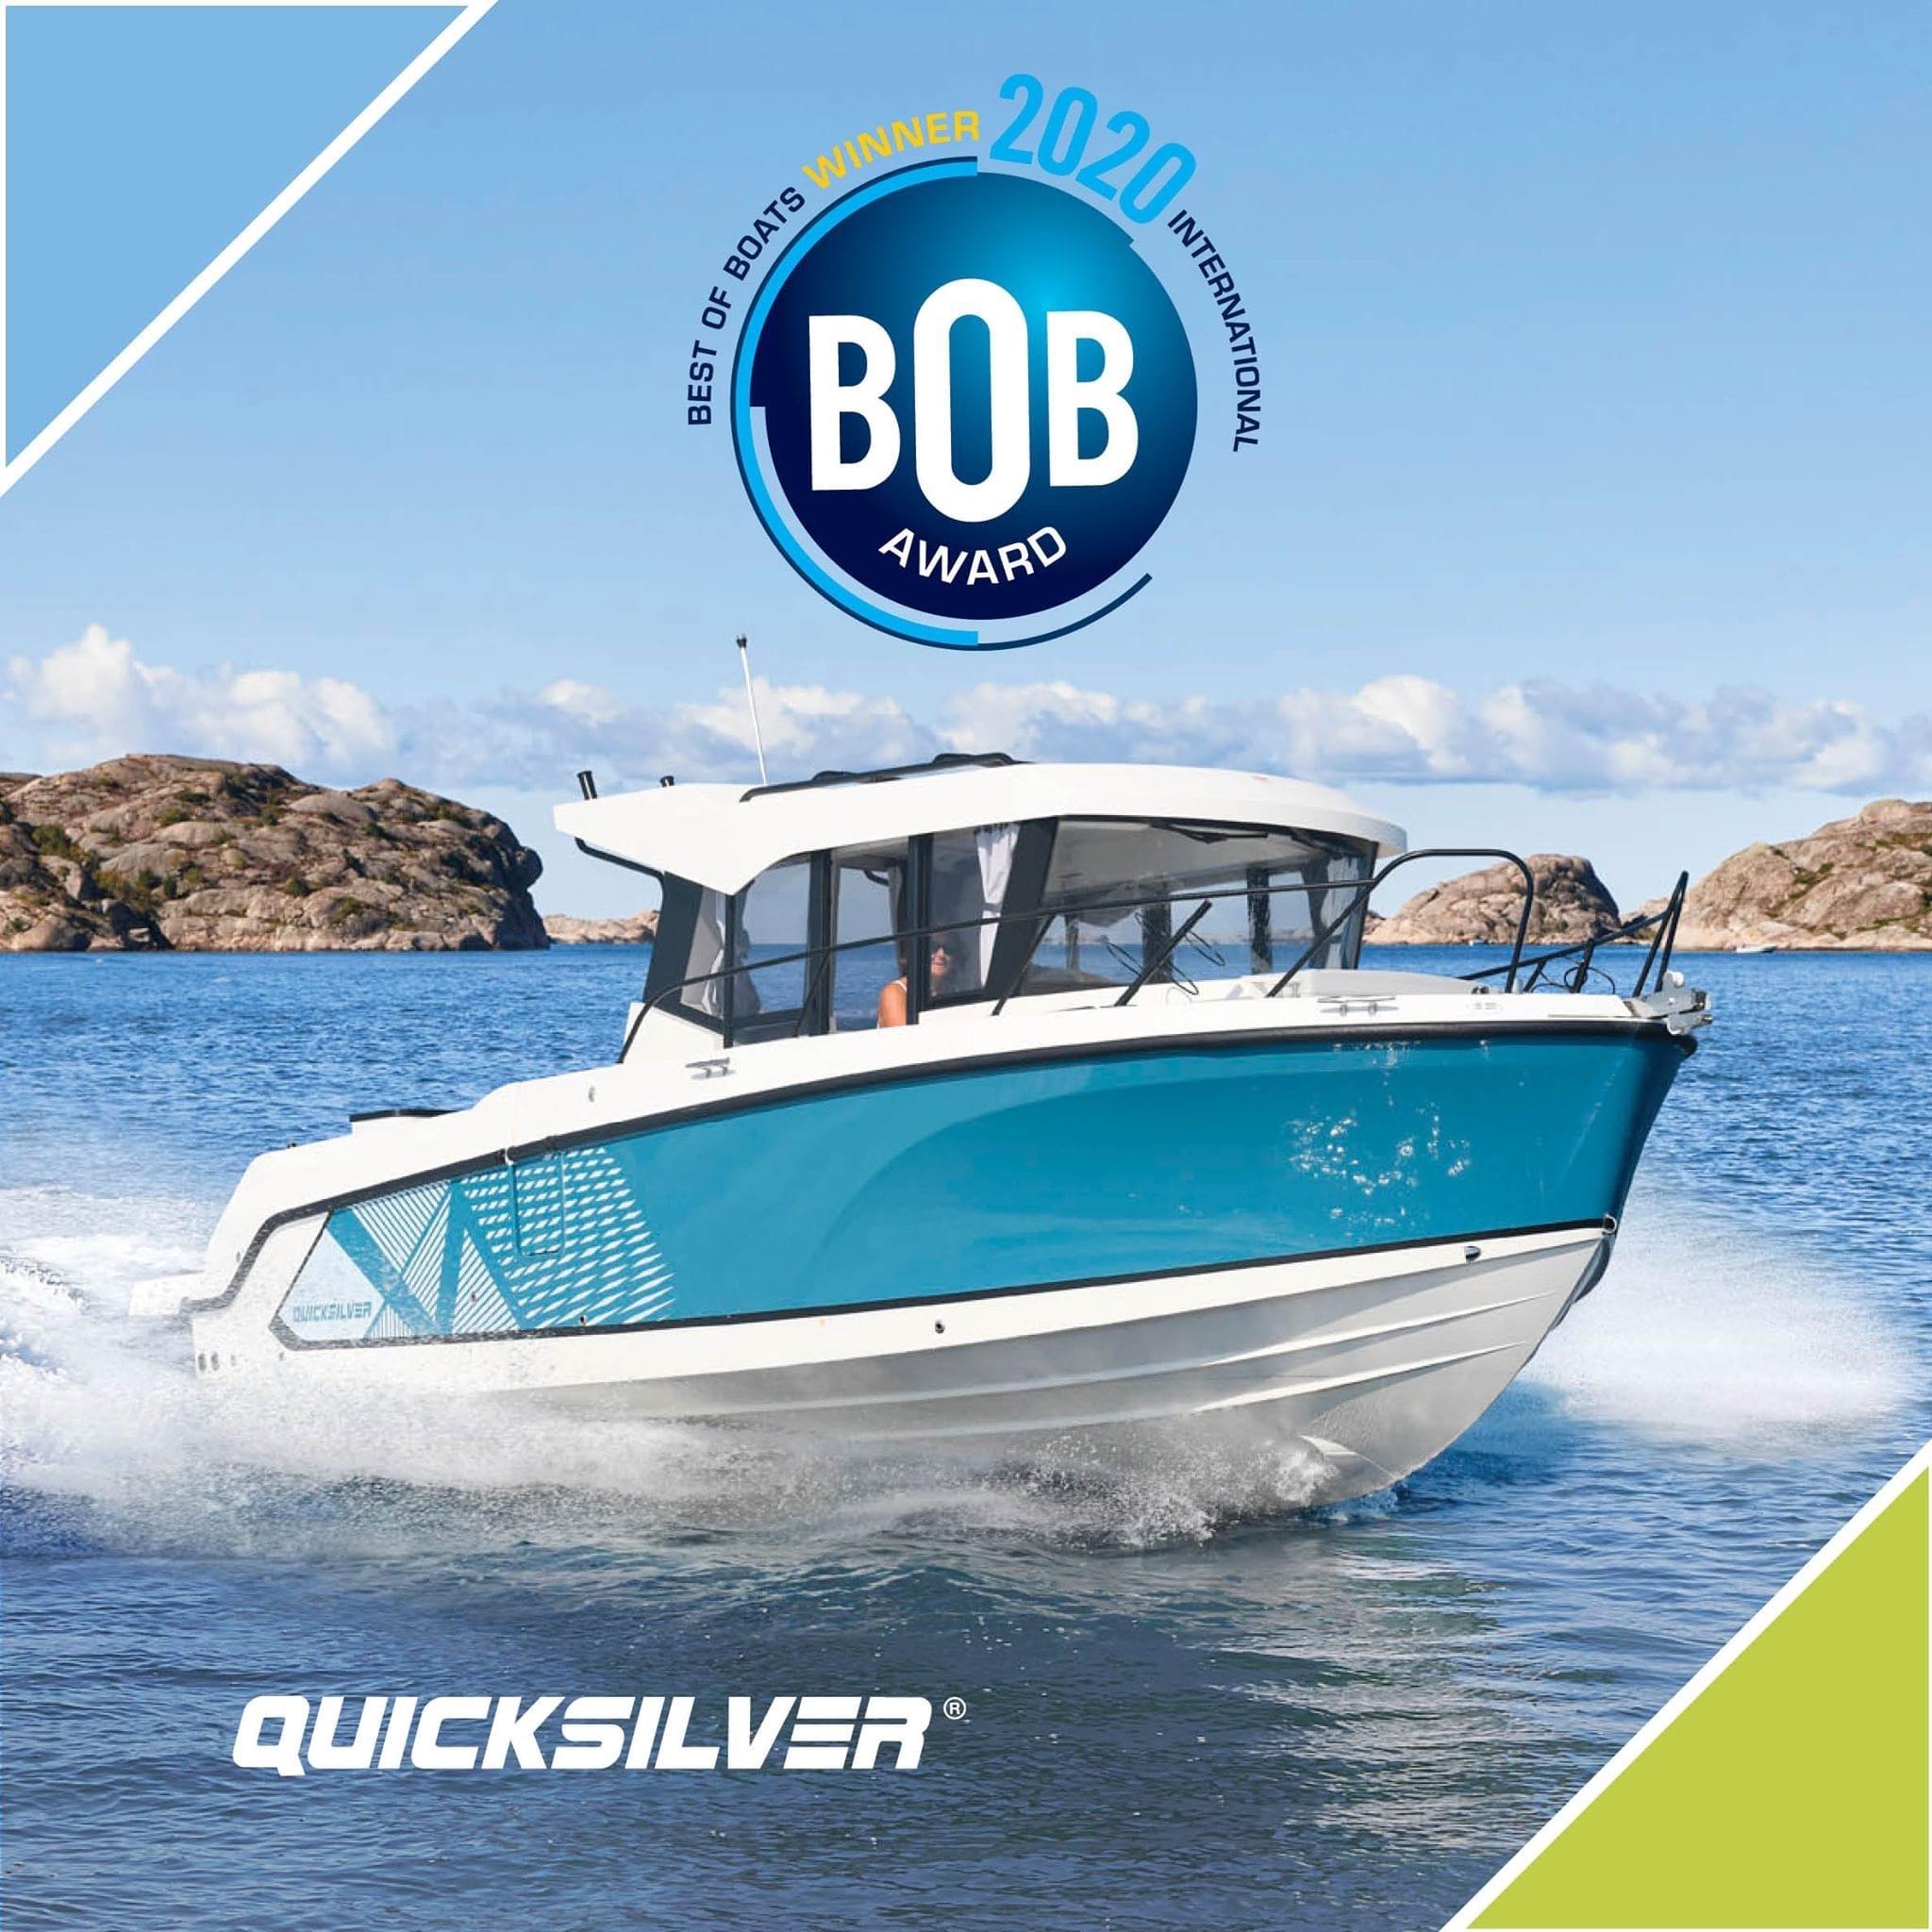 Quicksilver boat